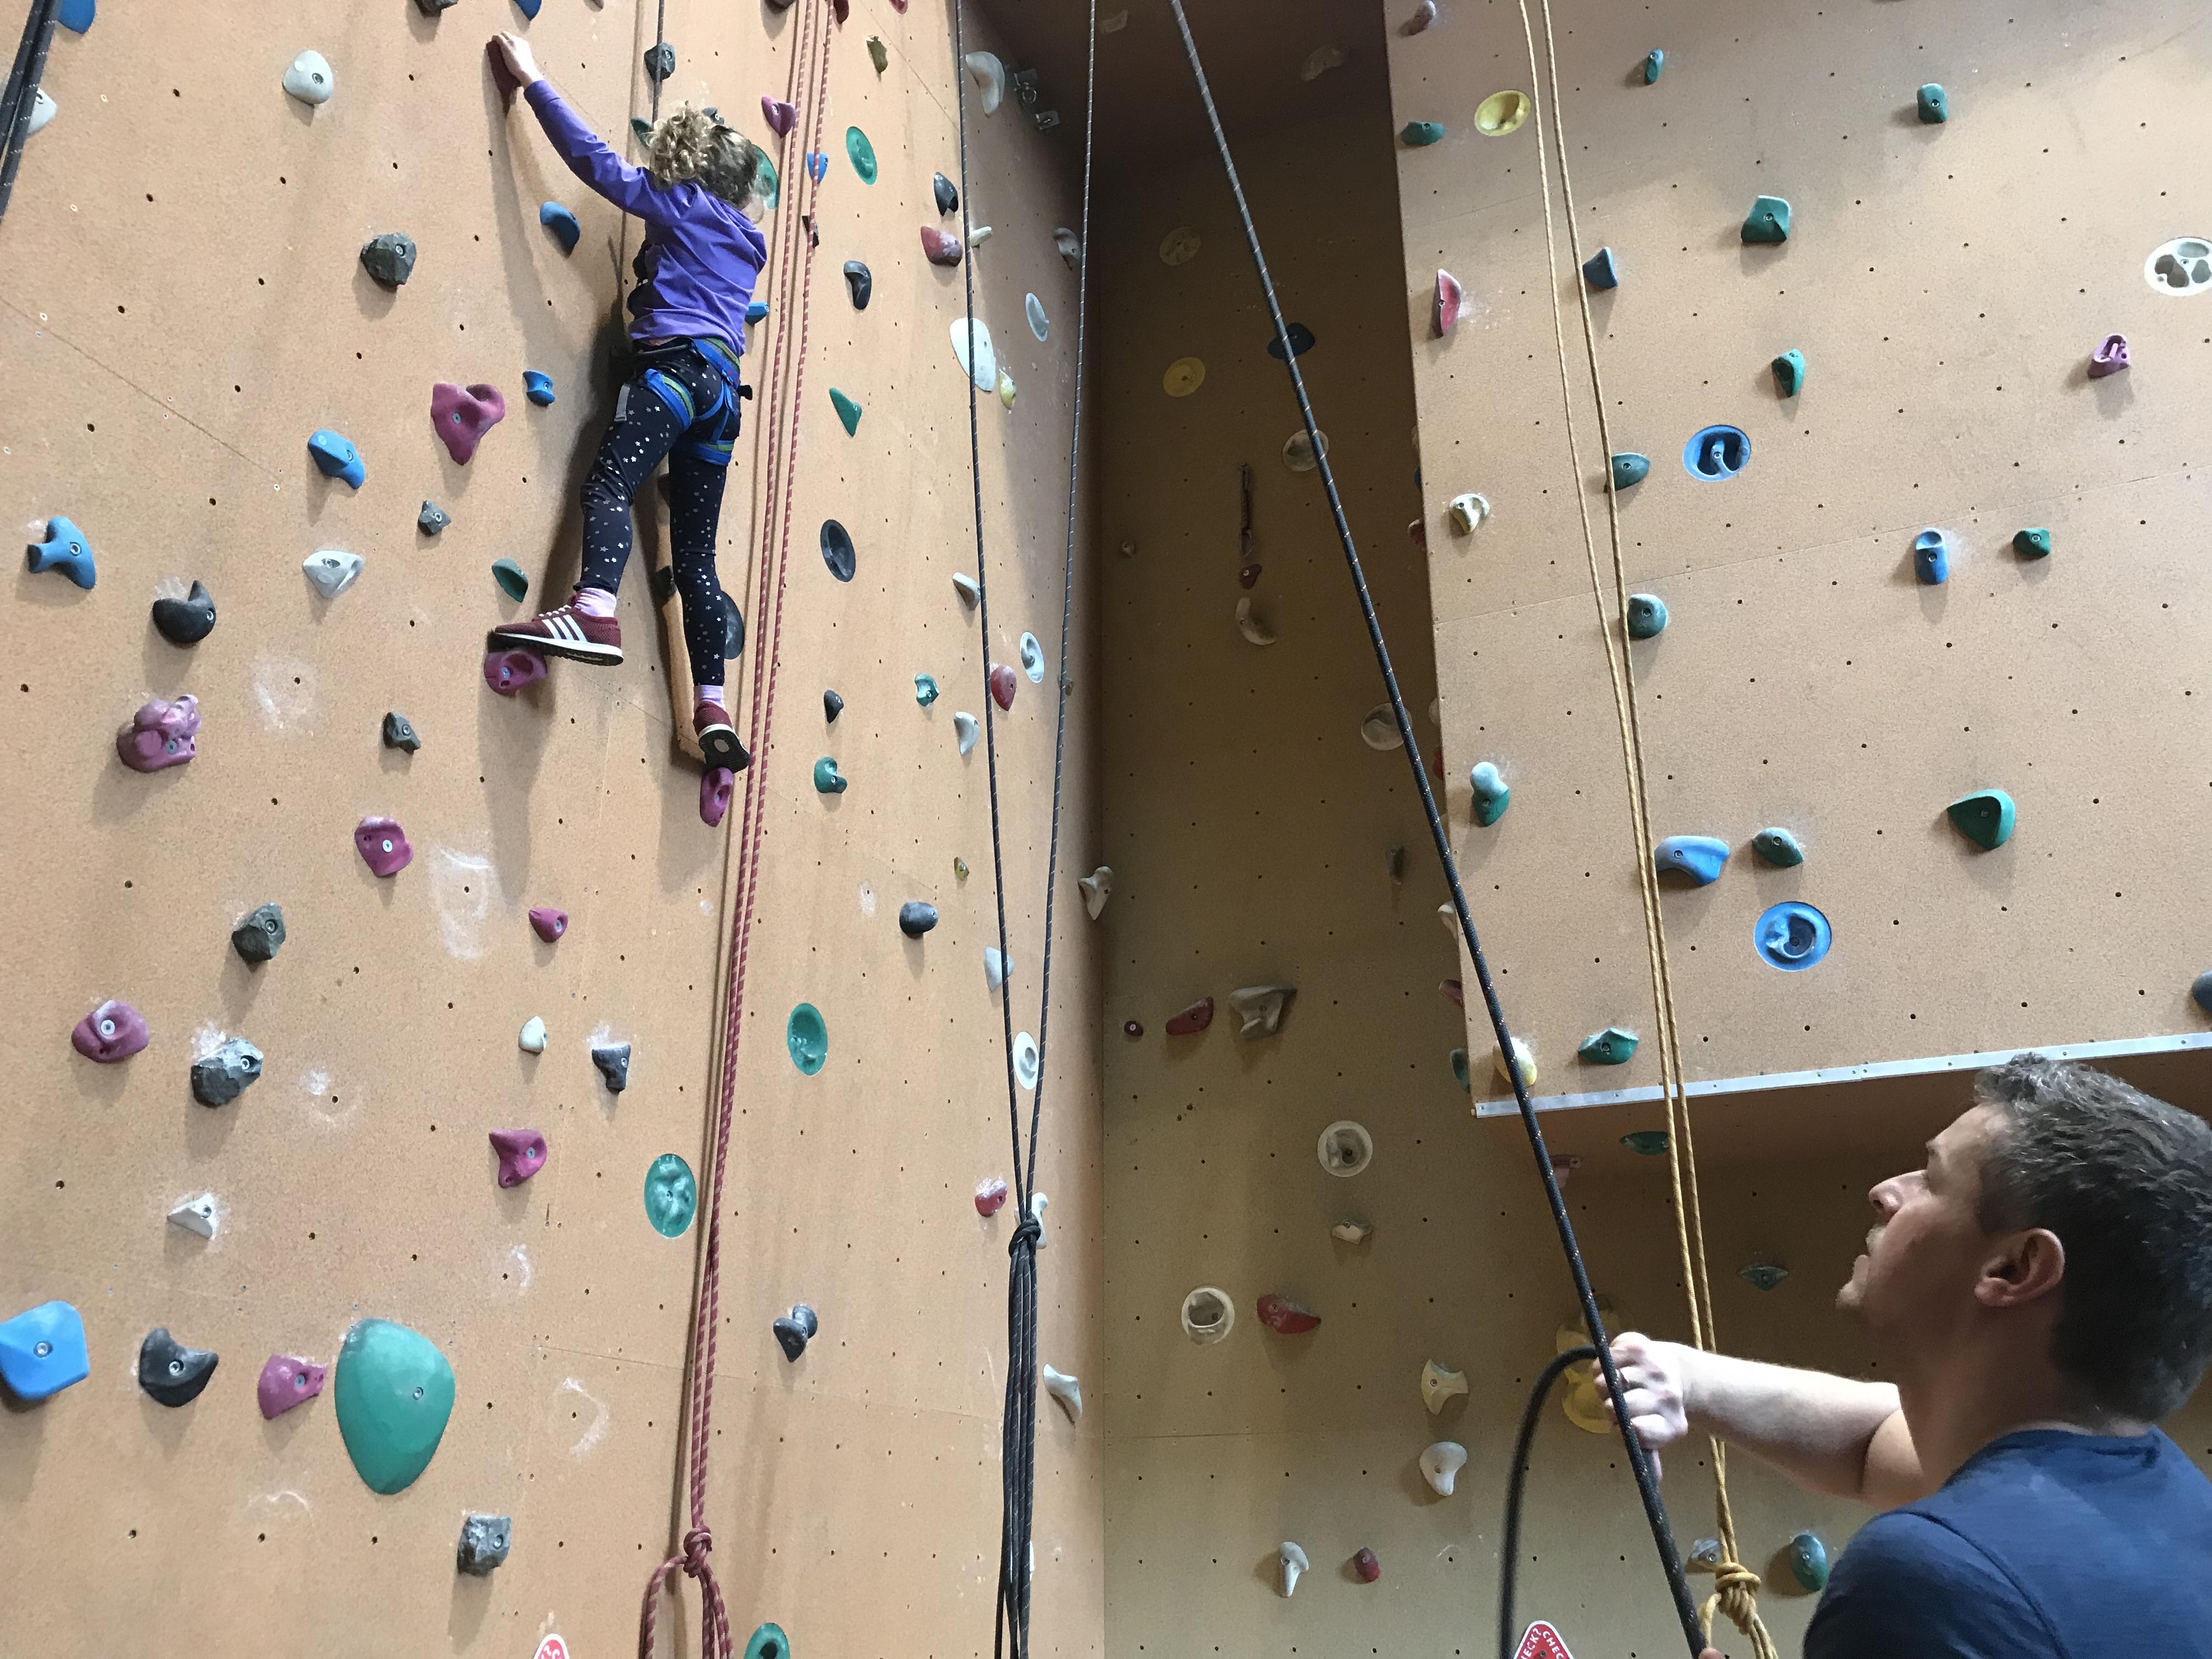 Ouder jeugdtraining, training met jouw zoon of dochter!